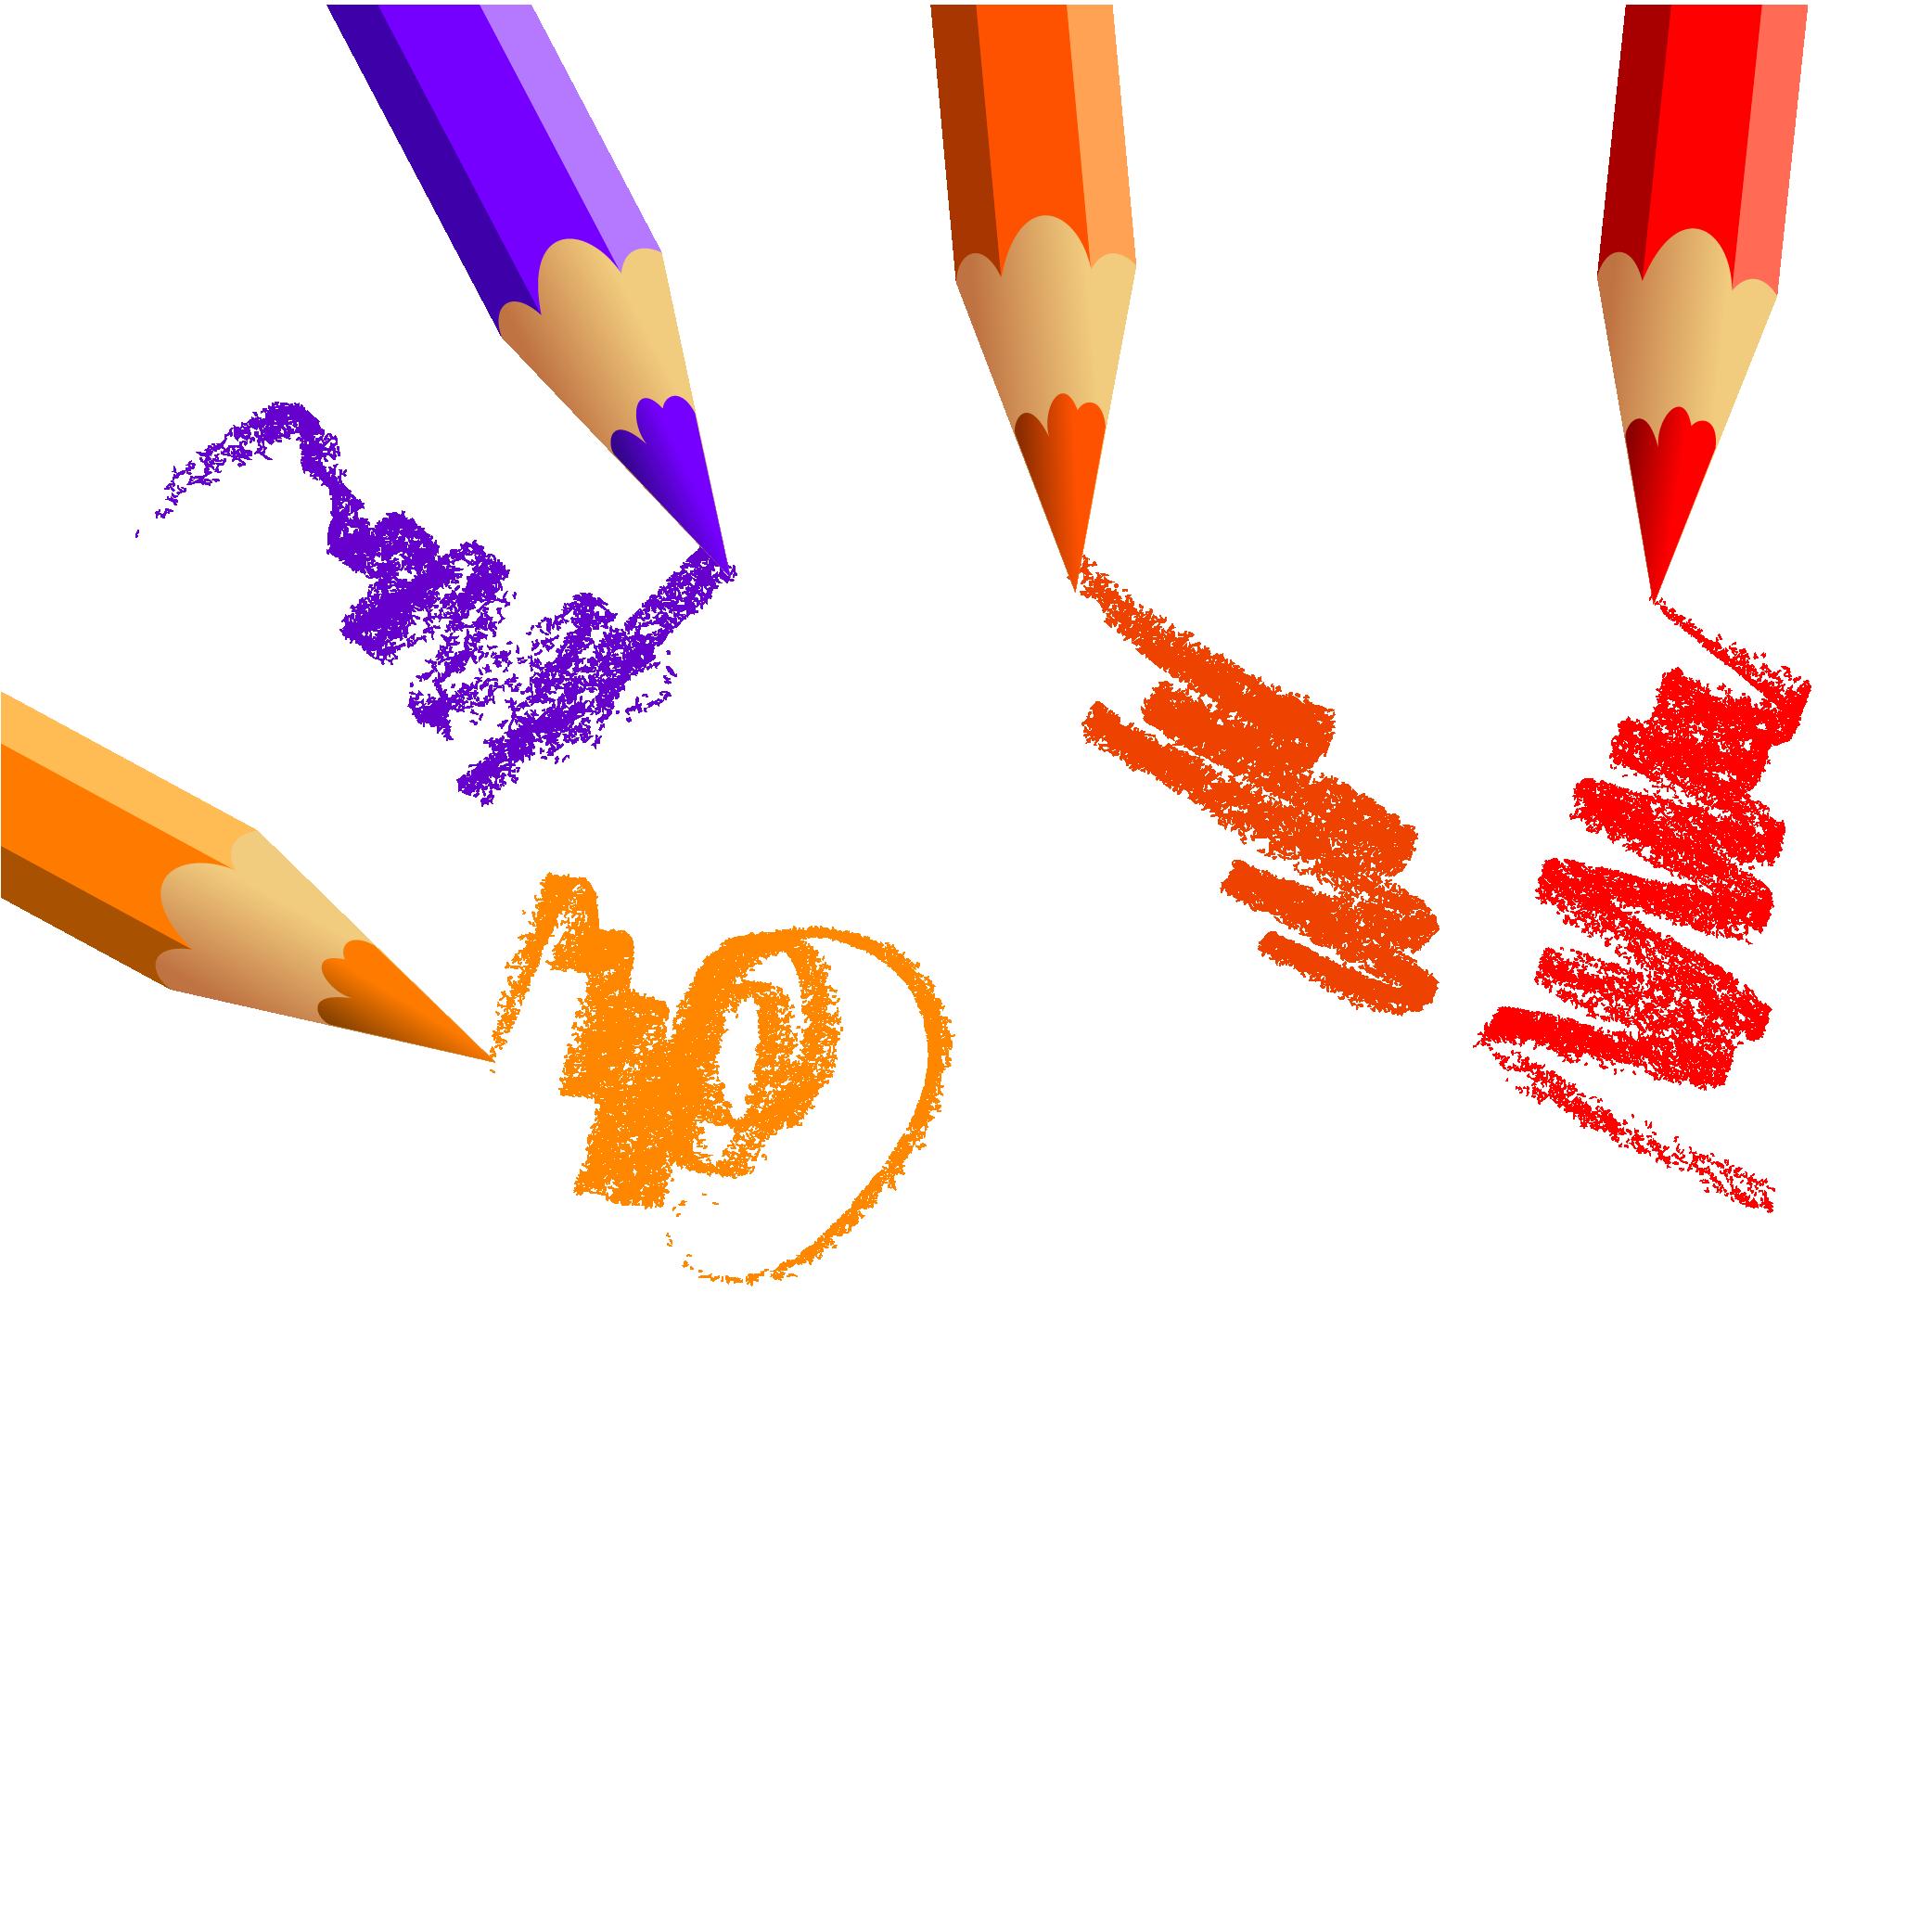 Pencil clipart colouring pencil. Colored drawing creative color